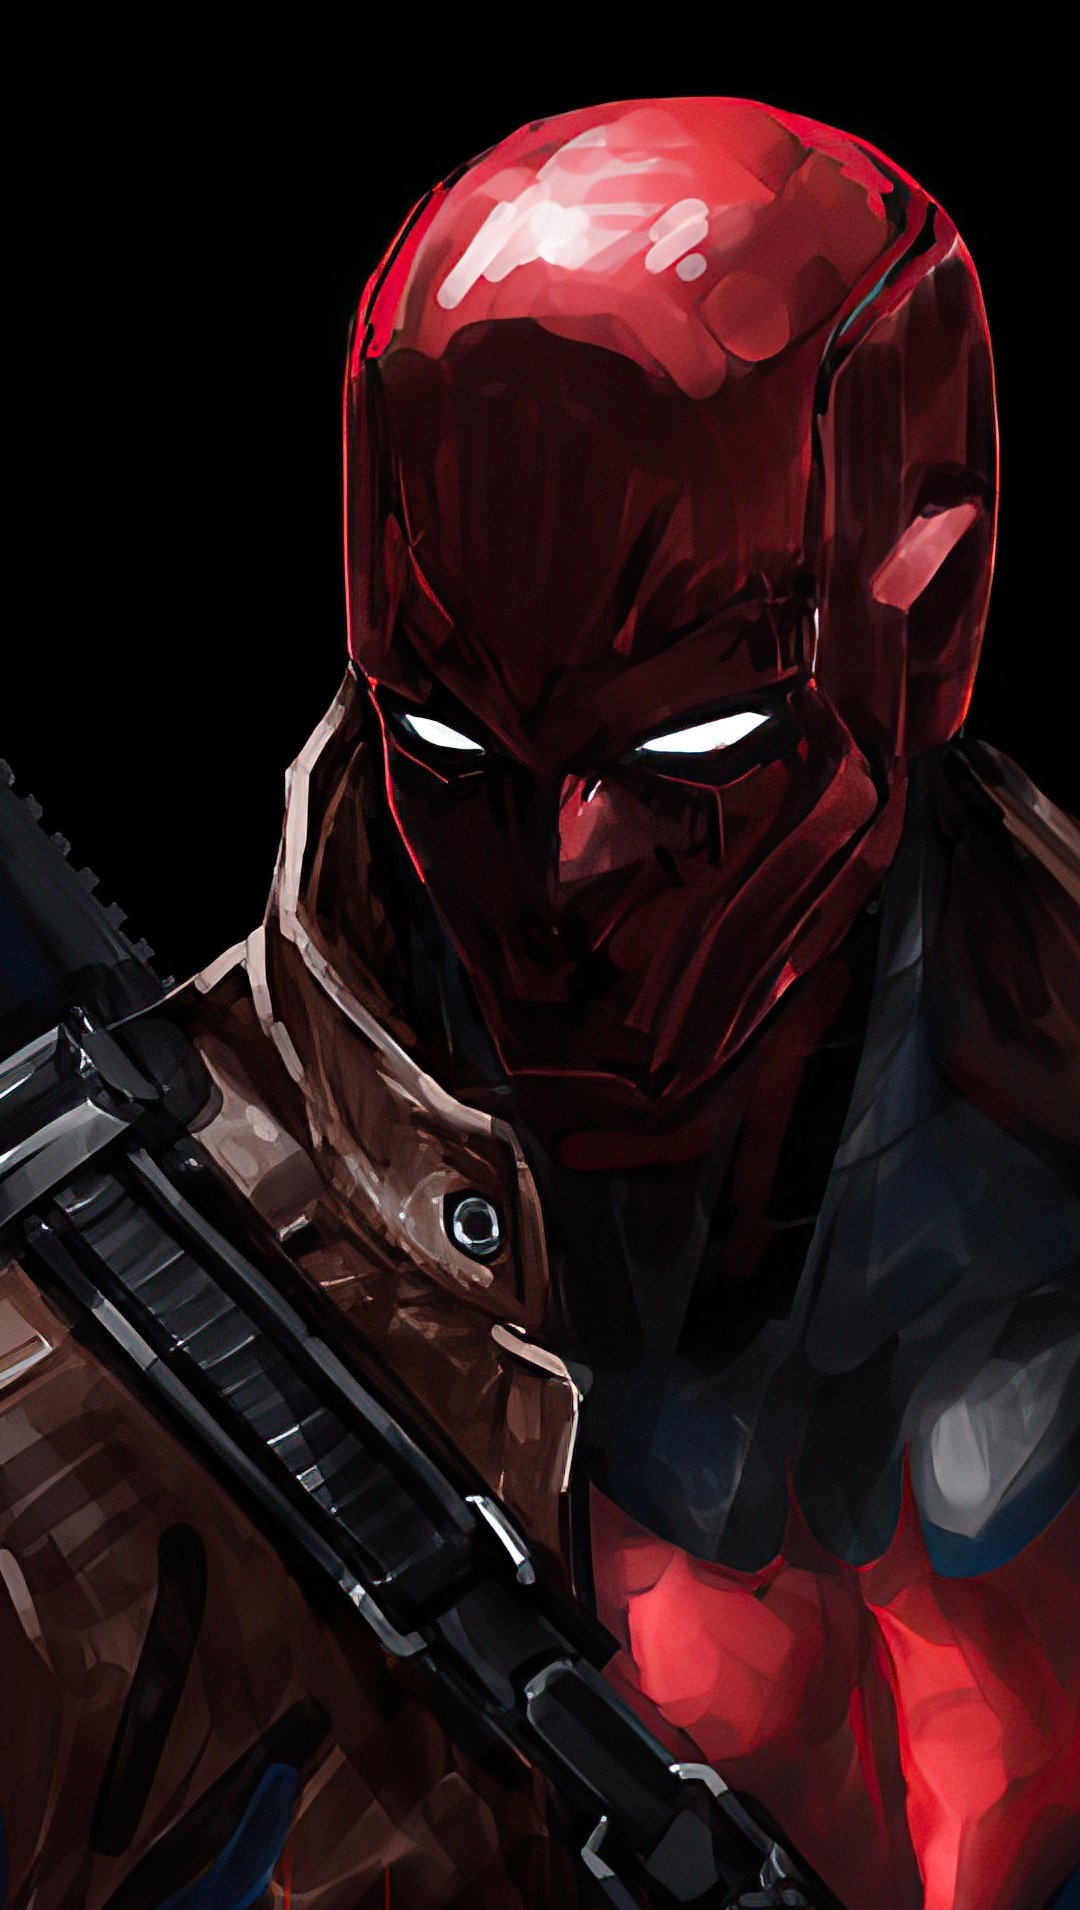 Fondos de pantalla Capucha roja con arma Vertical